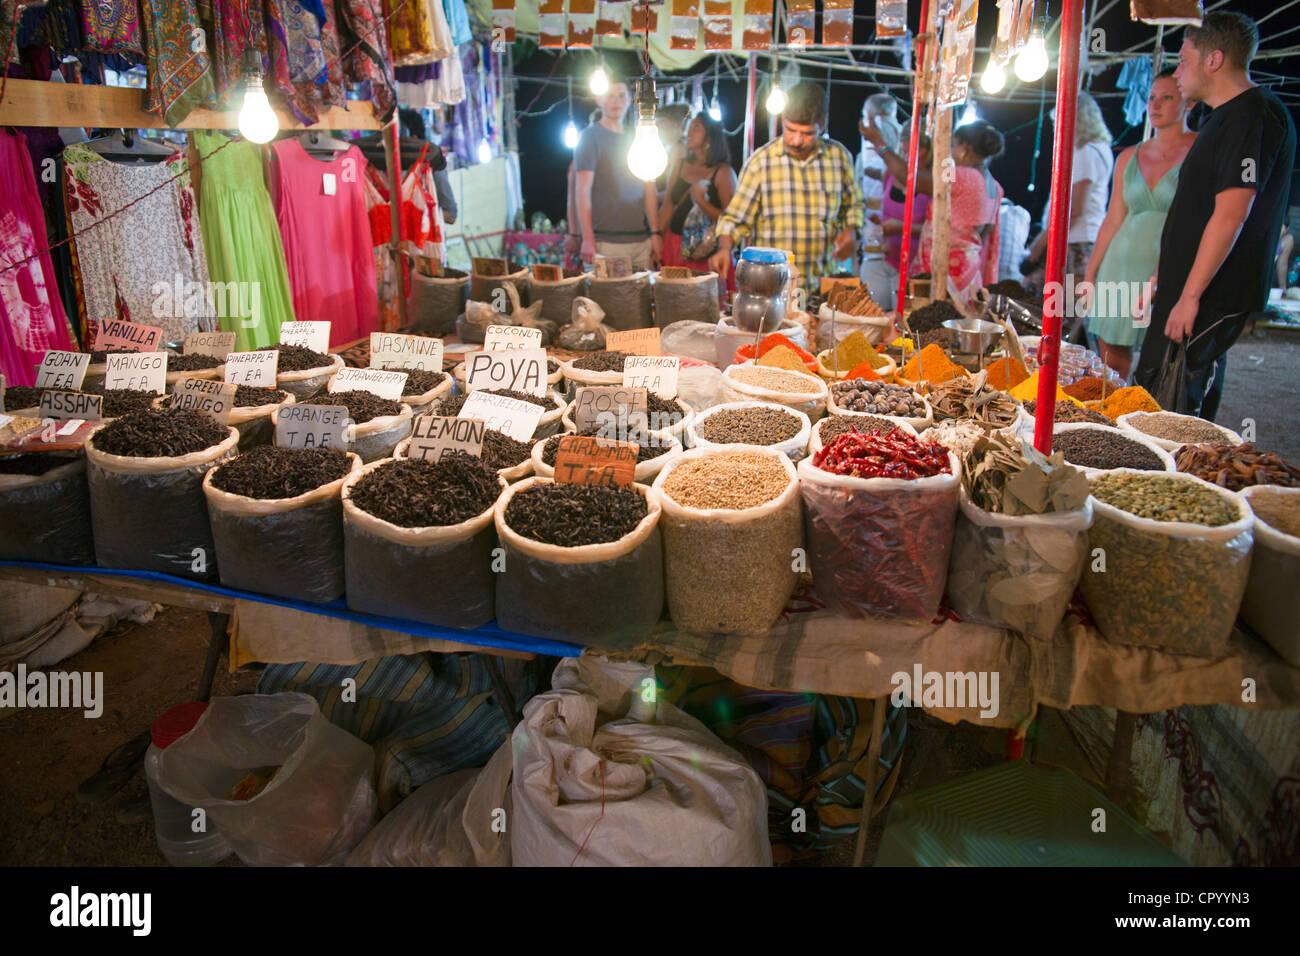 Norwich Market Food Stalls